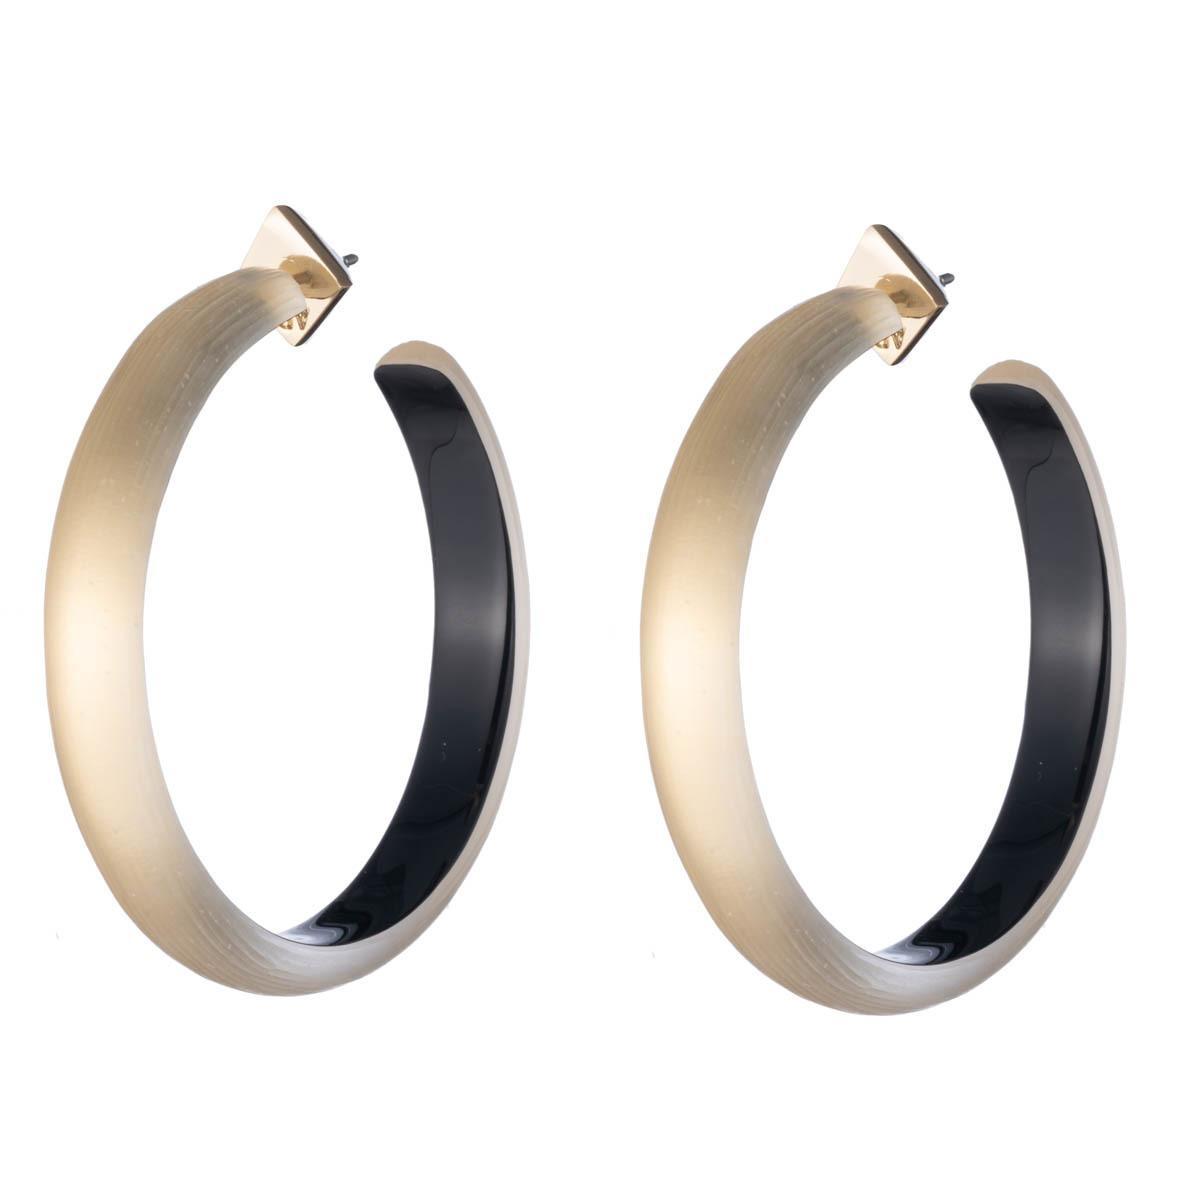 38b5b2c60 Alexis Bittar. Women's Metallic Large Slim Hoop Earring. $125 From Orchard  Mile